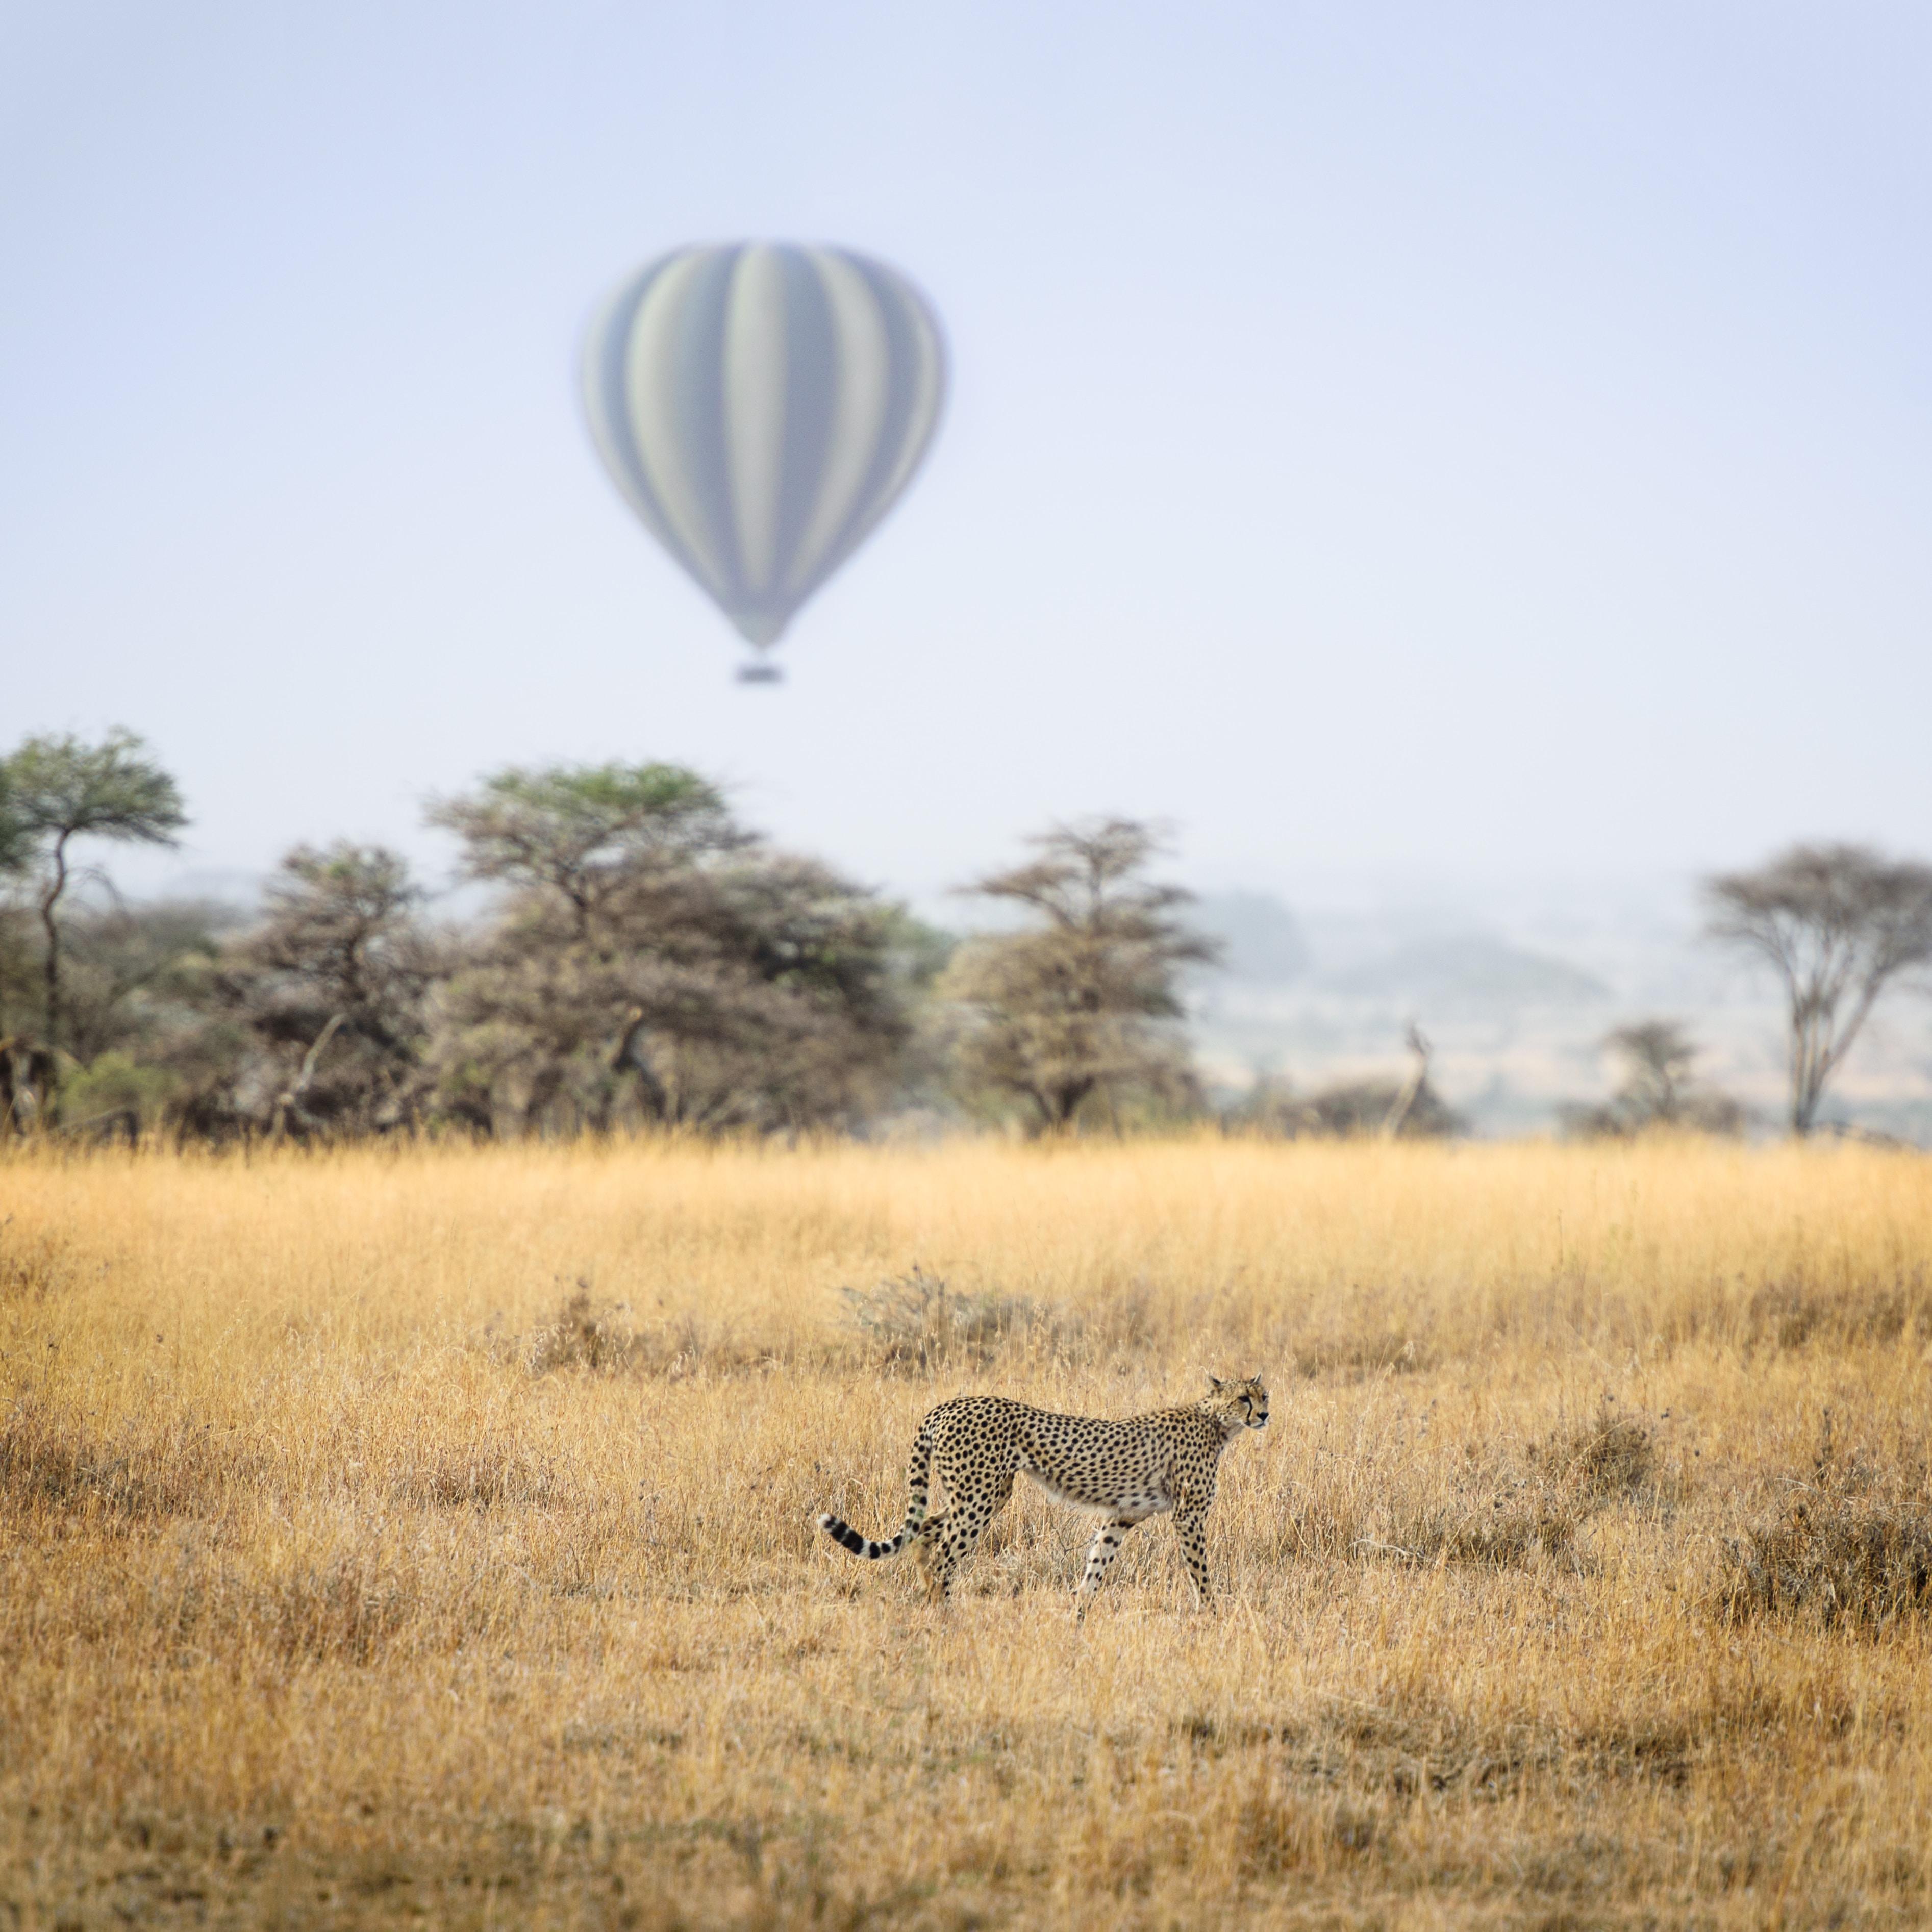 cheetah standing on grass plains during daytime